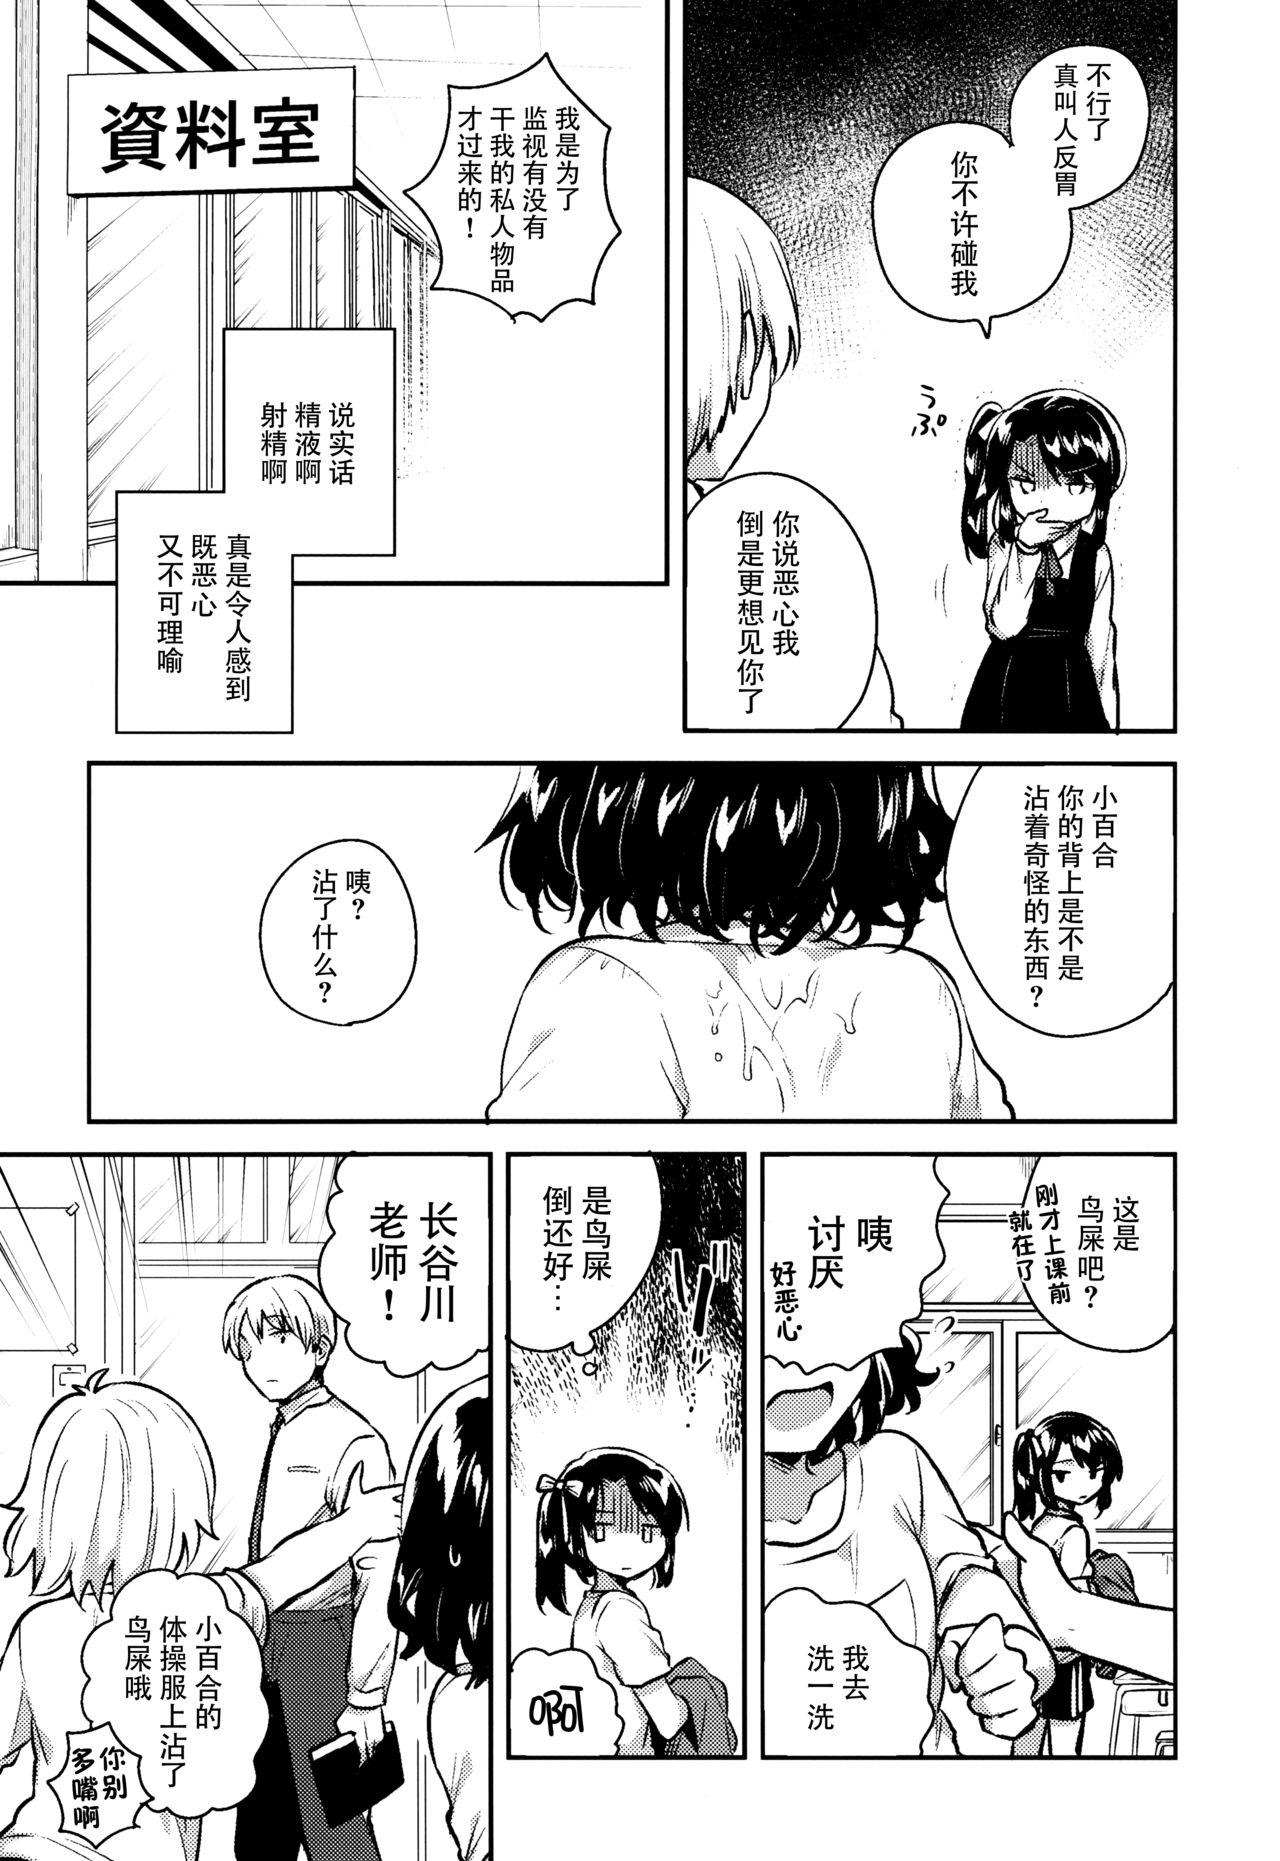 (SC2018 Spring) [squeezecandyheaven (Ichihaya)] Sensei wa Lolicon de Saitei Hentai no Gomikuzu [Zen] + Omake [Chinese] [脸肿汉化组] 7